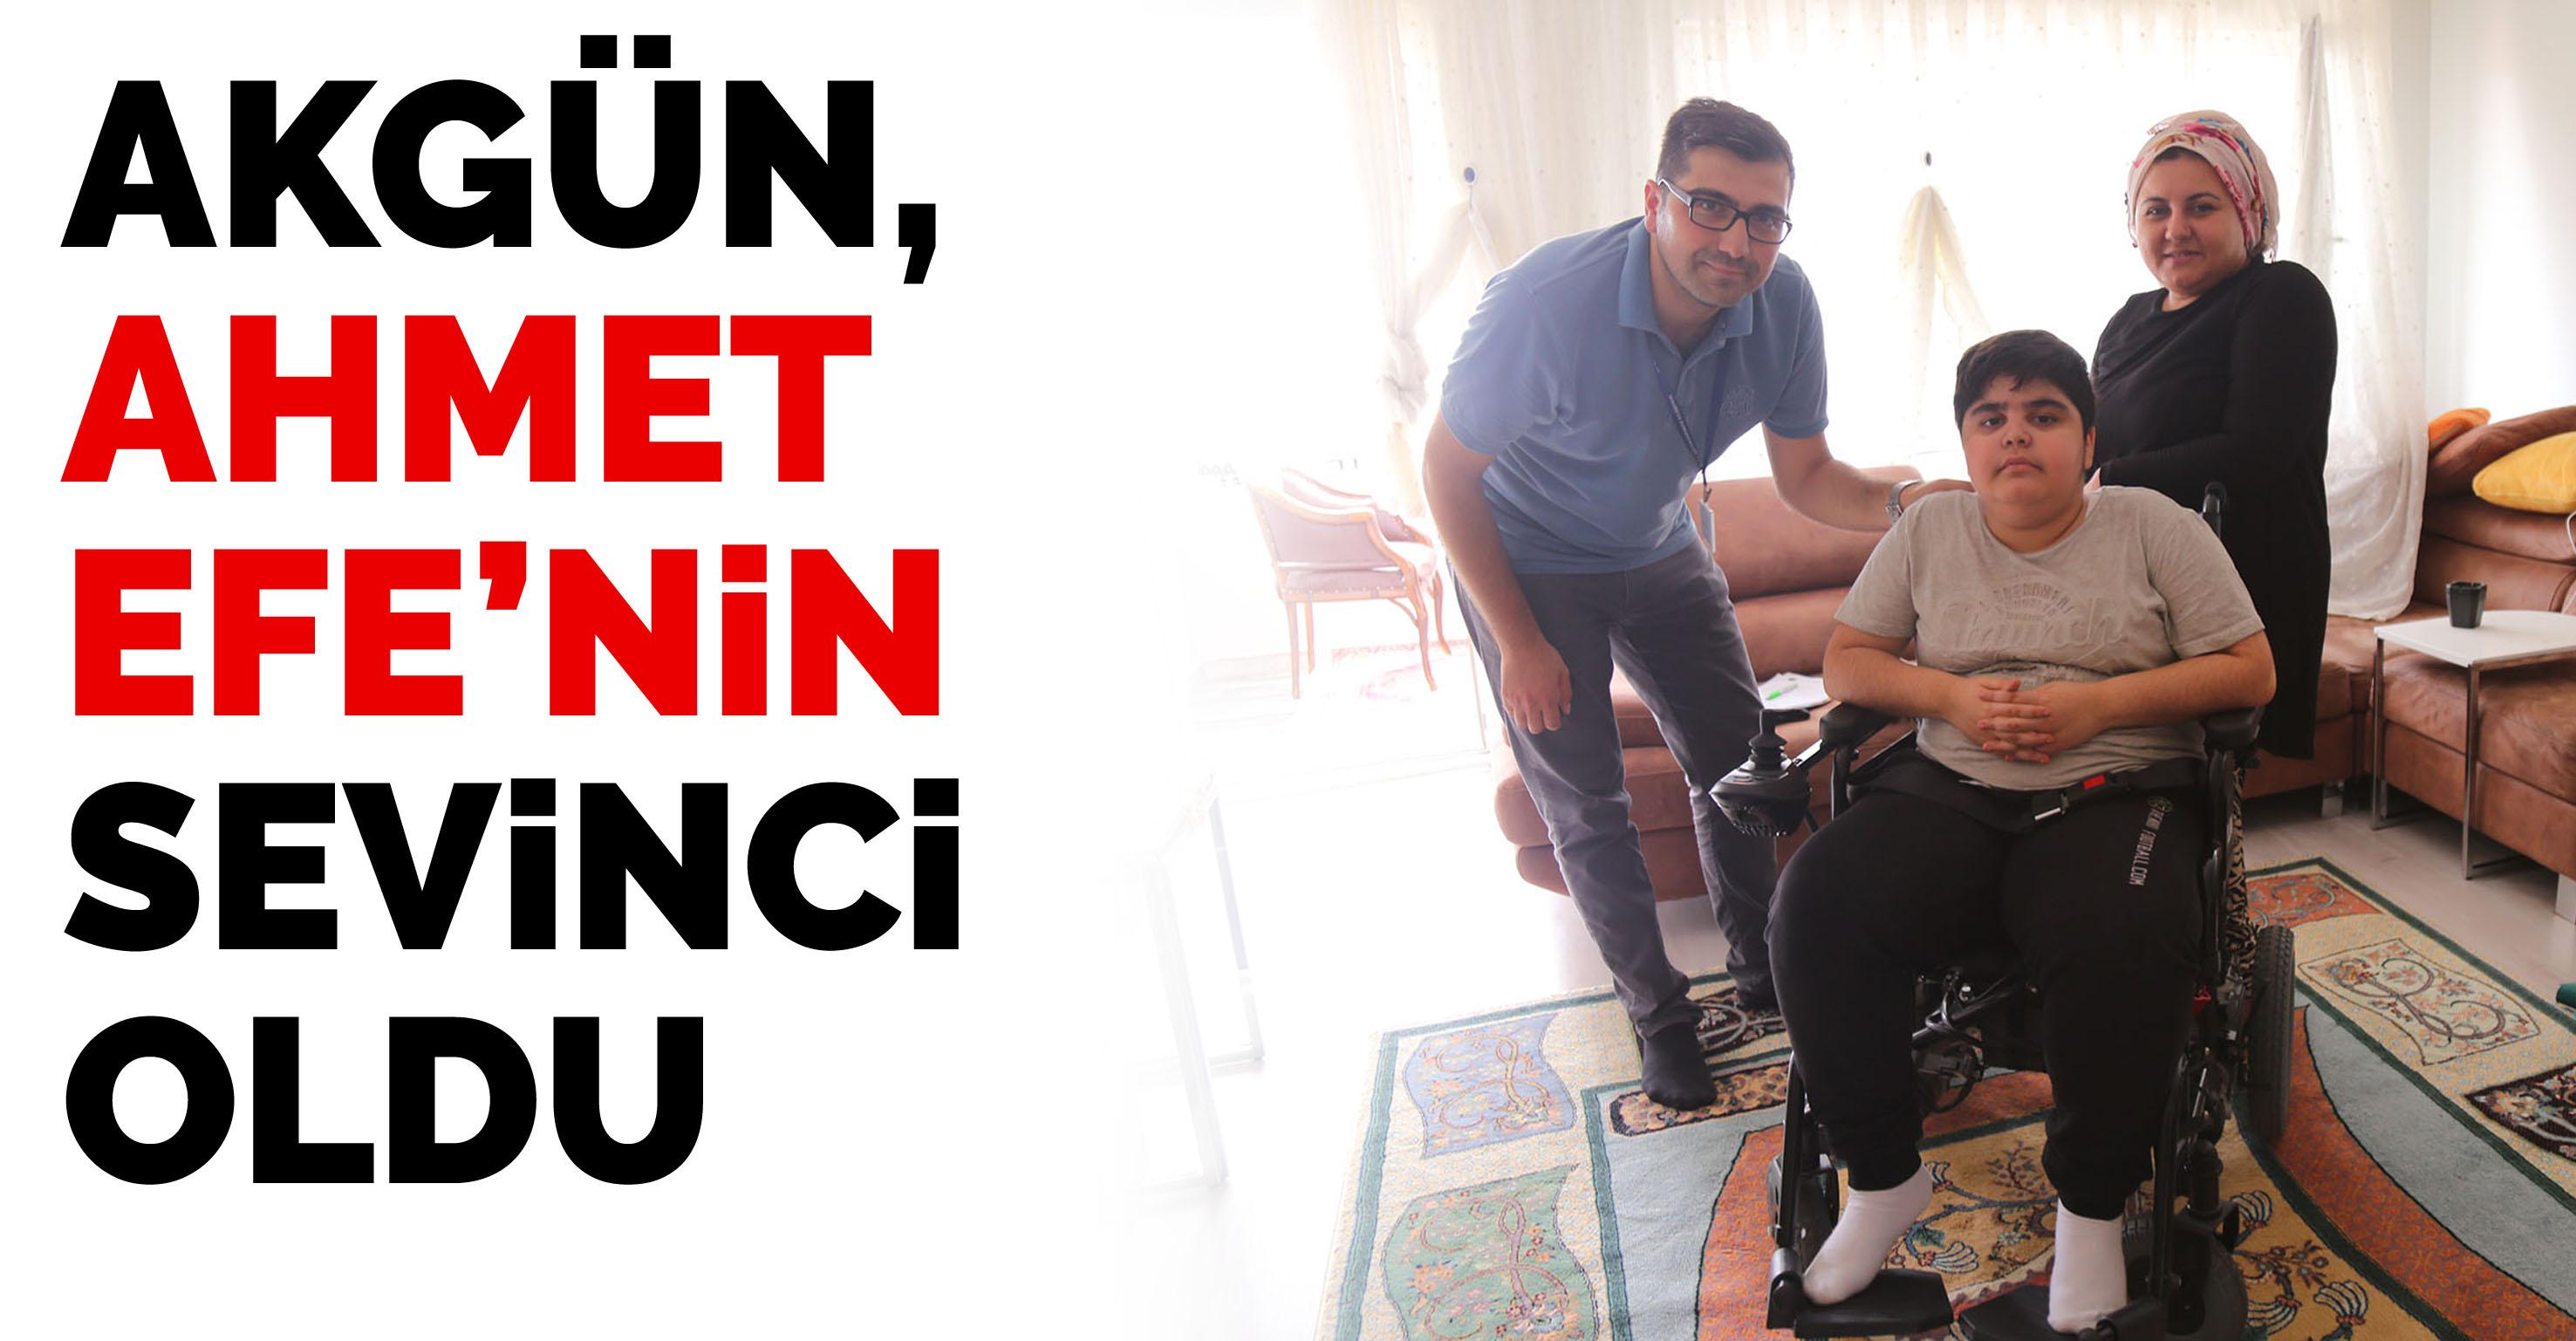 Başkan Akgün, bu kez de Ahmet Efe'nin sevinci oldu